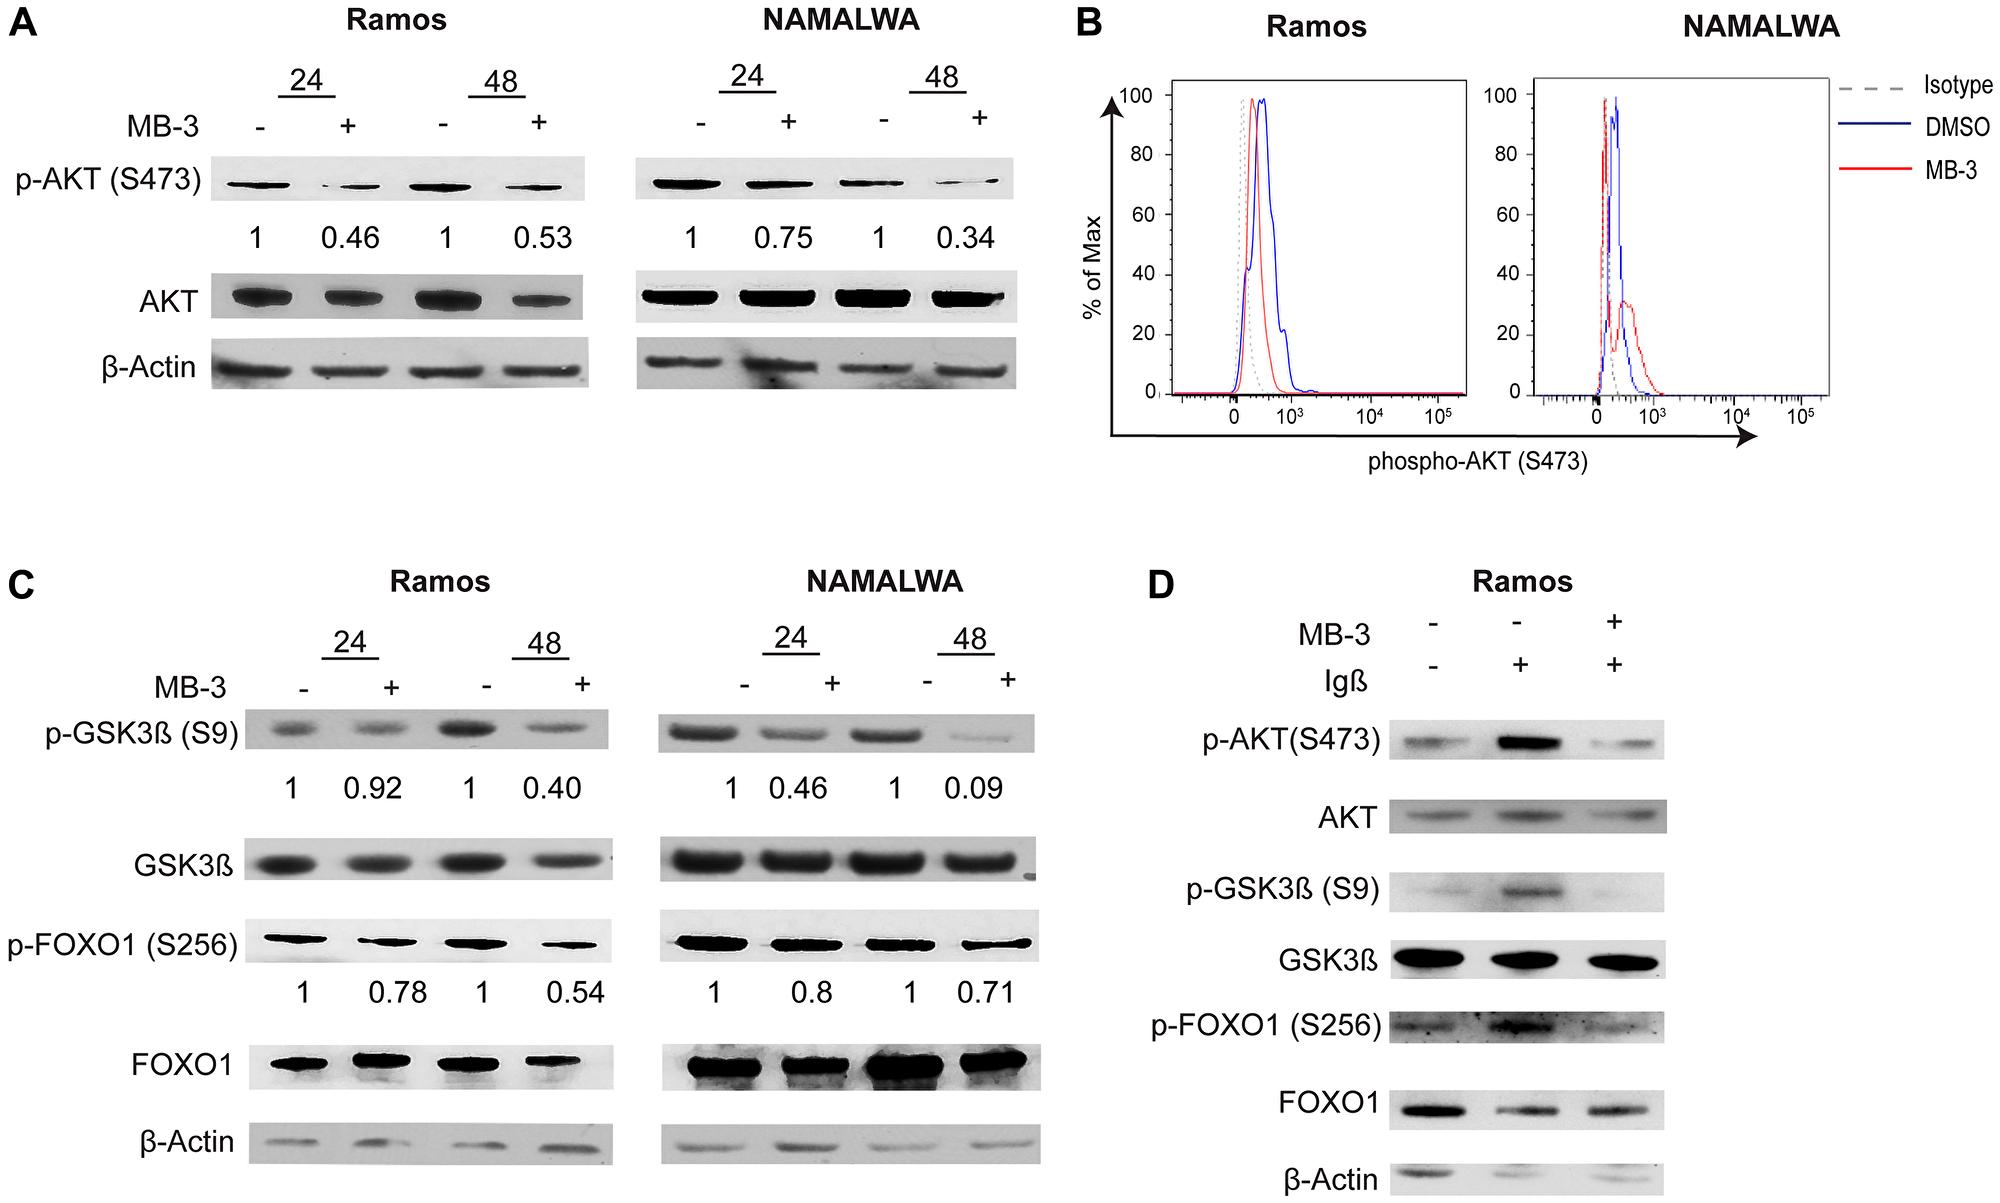 GCN5 inhibition attenuates PI3K signaling in human Burkitt lymphoma cell lines.